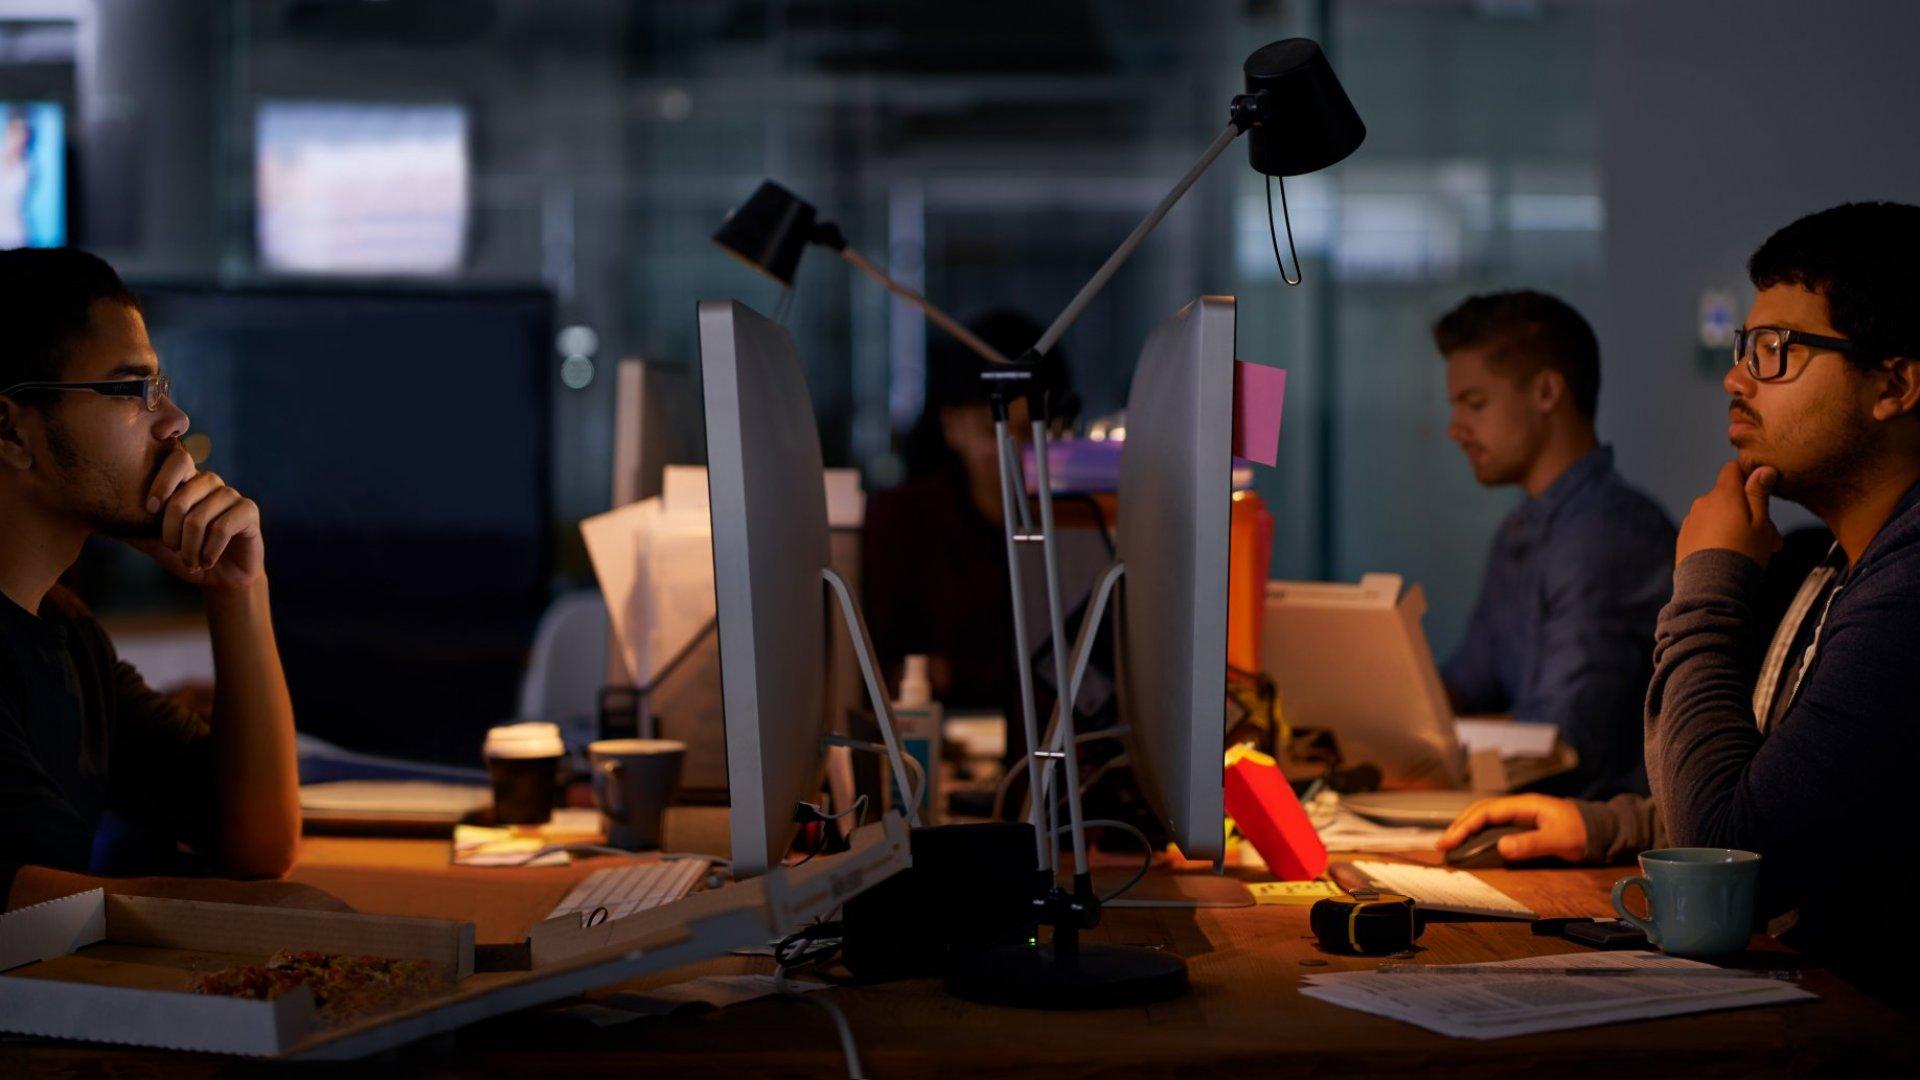 How Working Smarter -- Not Harder Drives Motivation